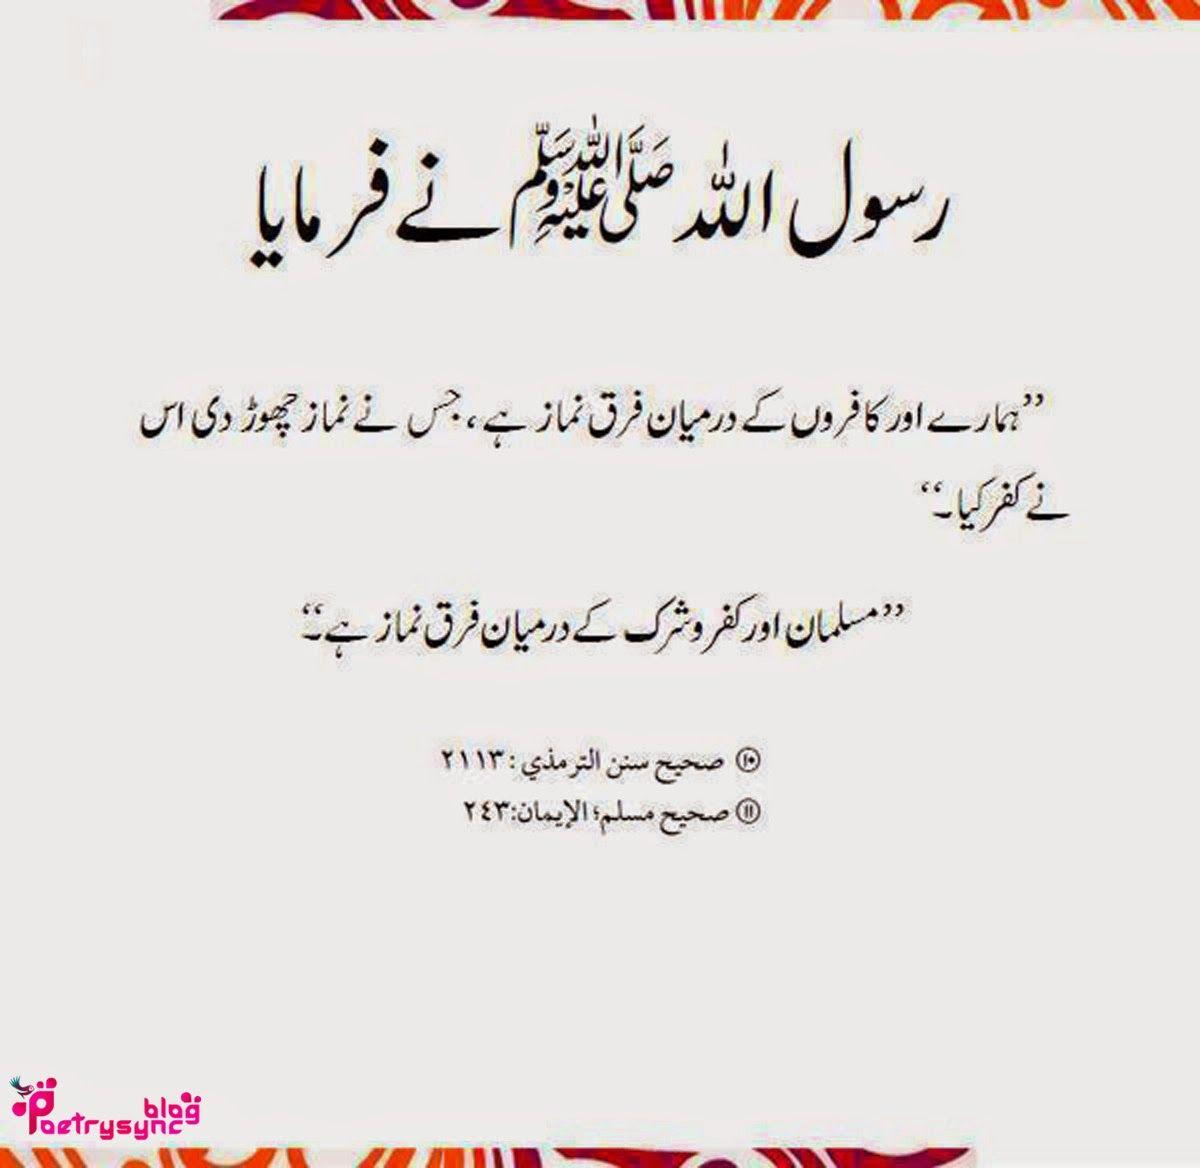 Quotes In Urdu: Islamic Hadith Quotes On Love, Islamic Hadith Quotes In